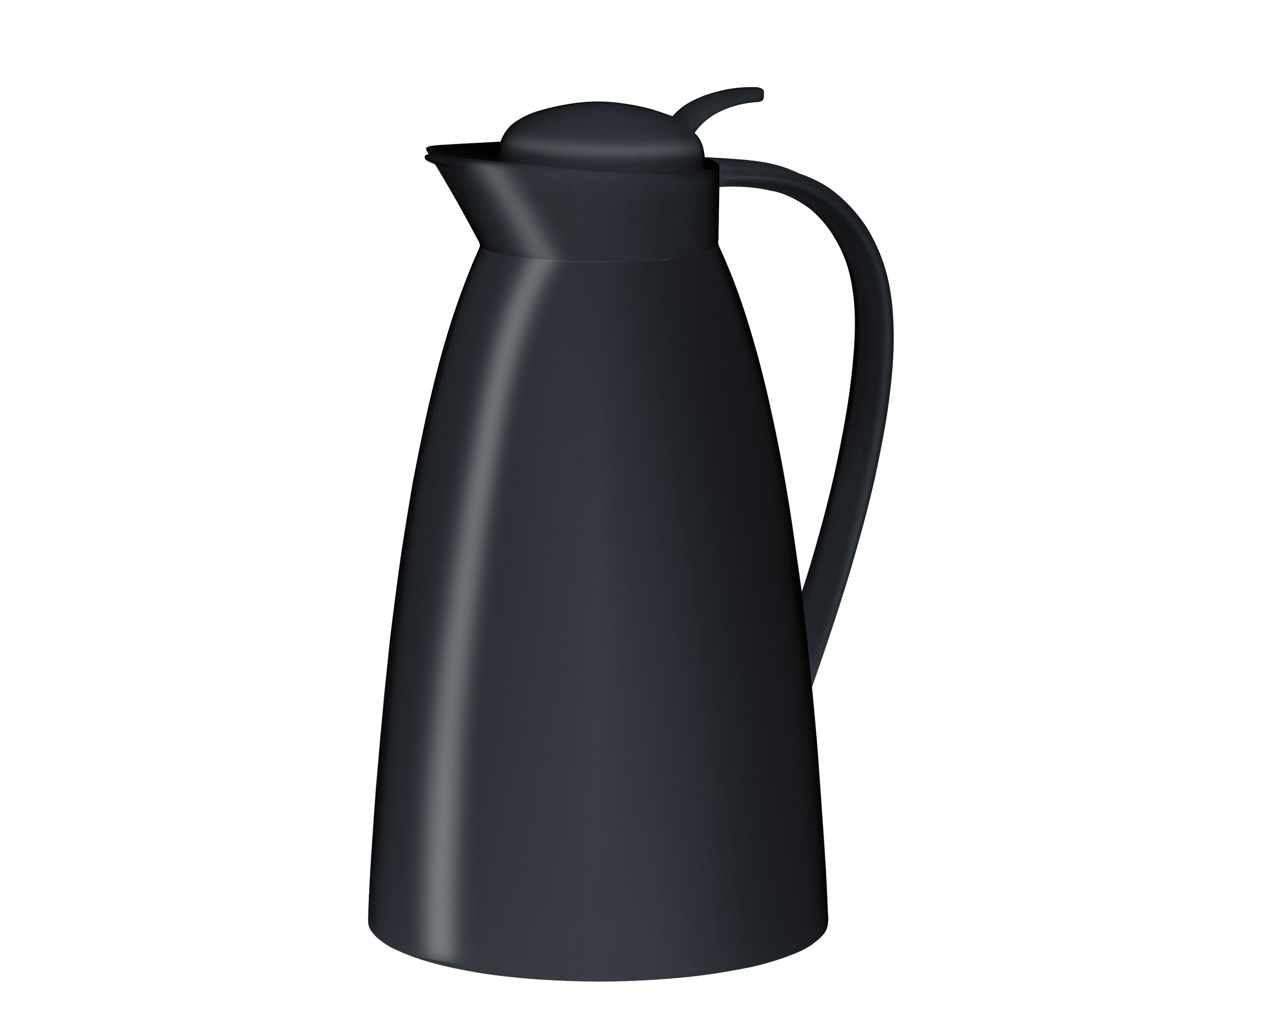 Eco termoskanna svart, 1 liter